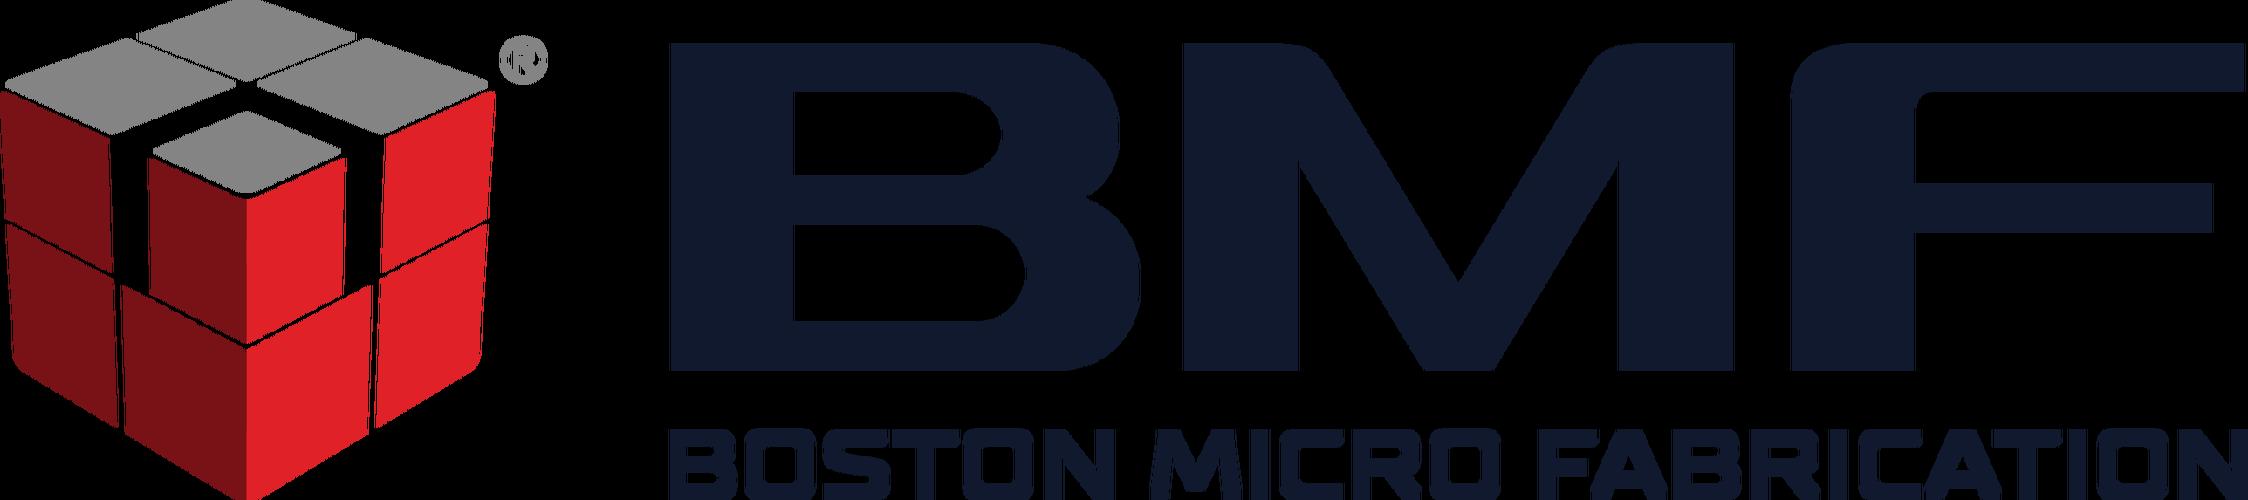 Boston Micro Fabrication - BMF